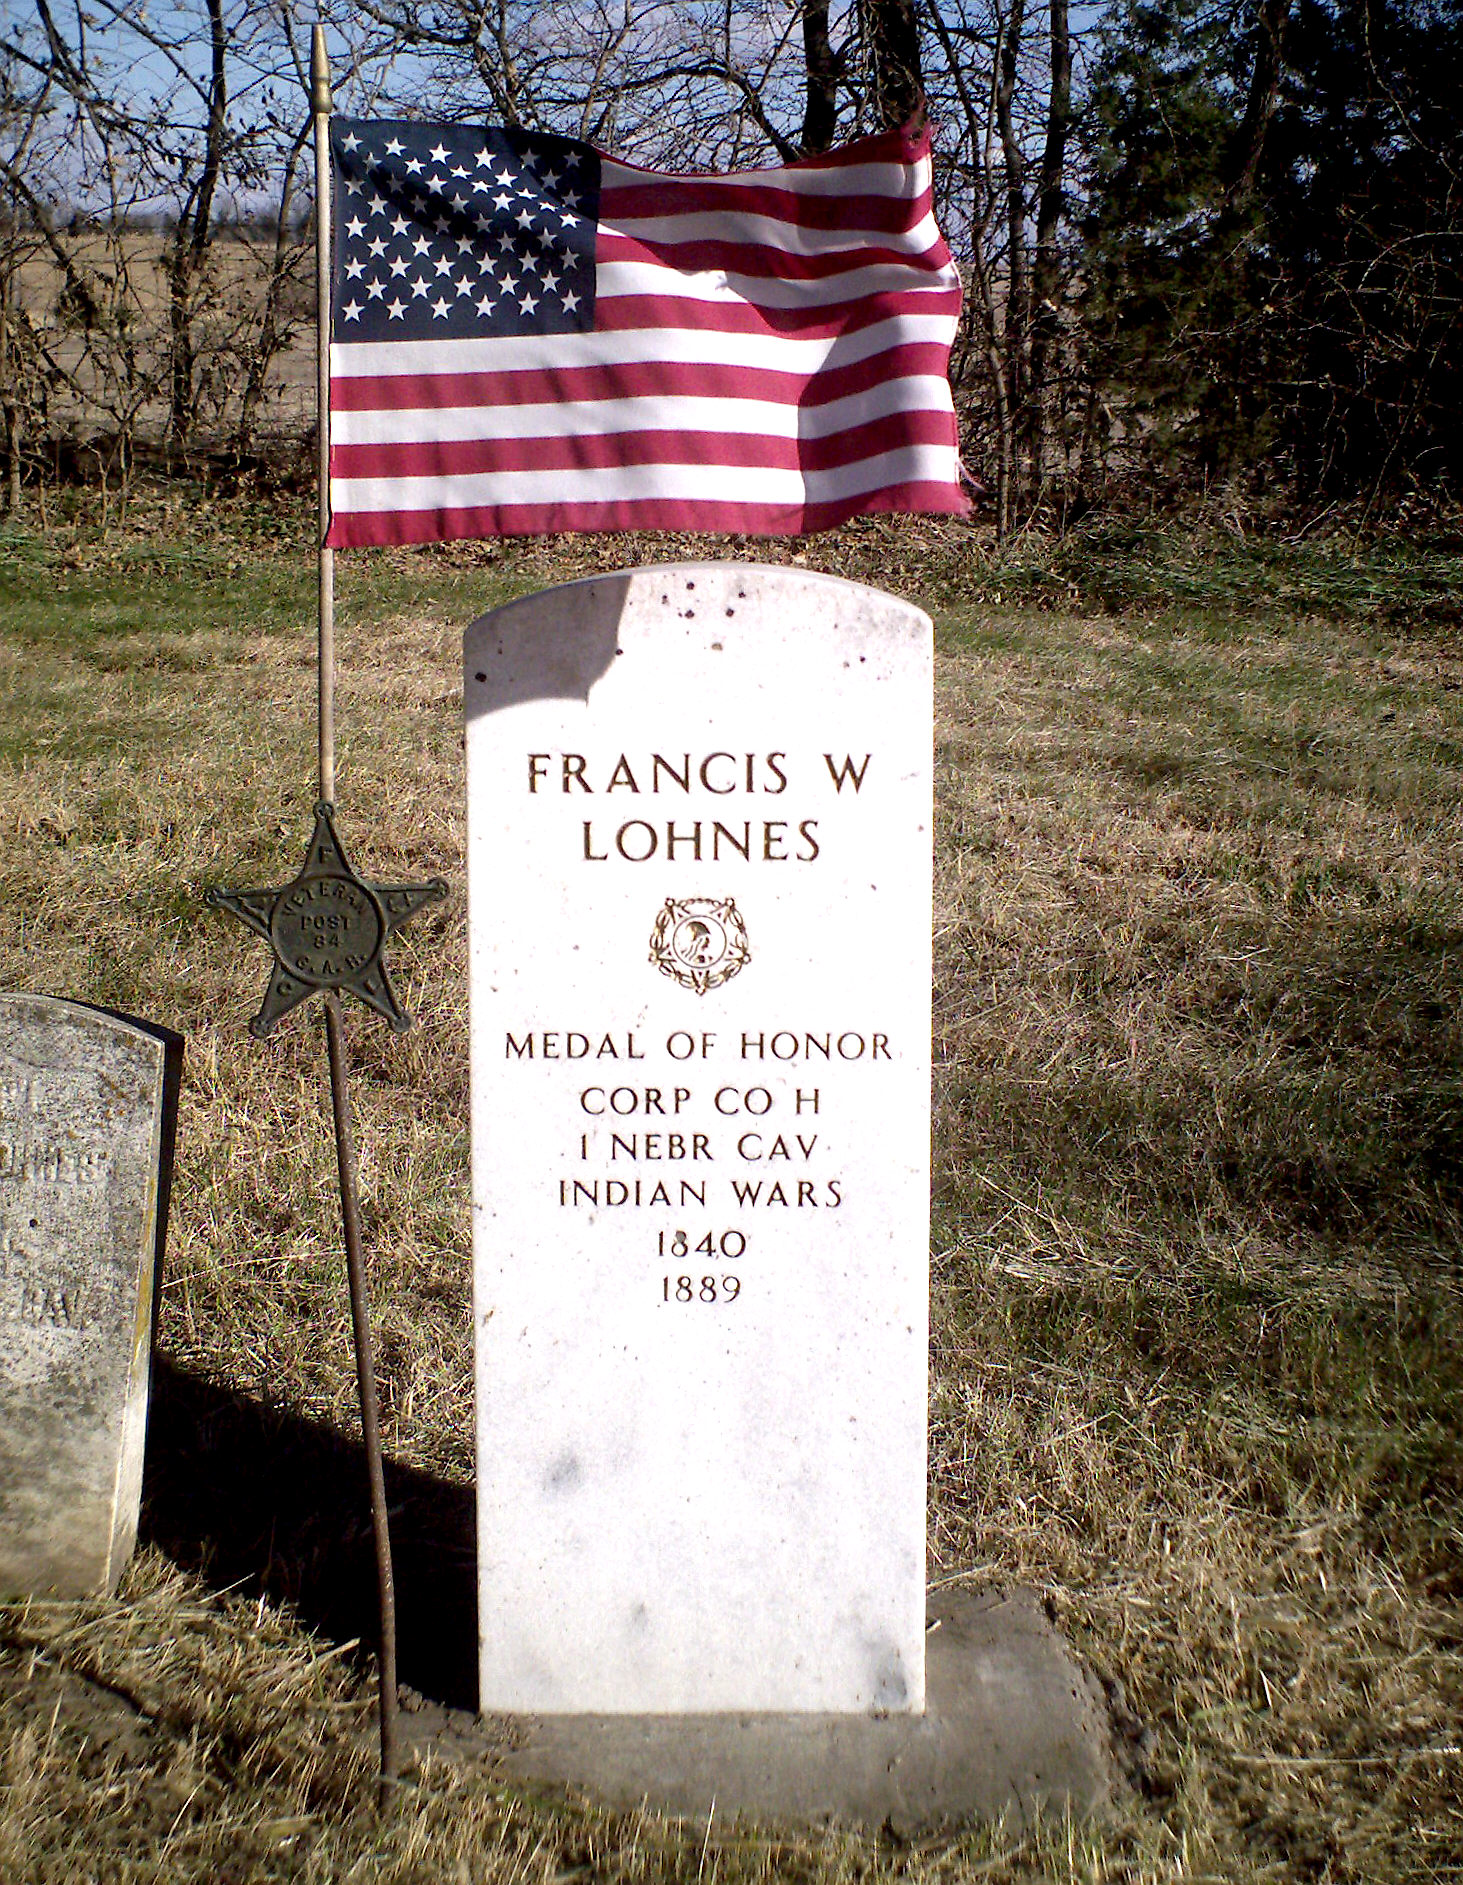 Francis W. Lohnes